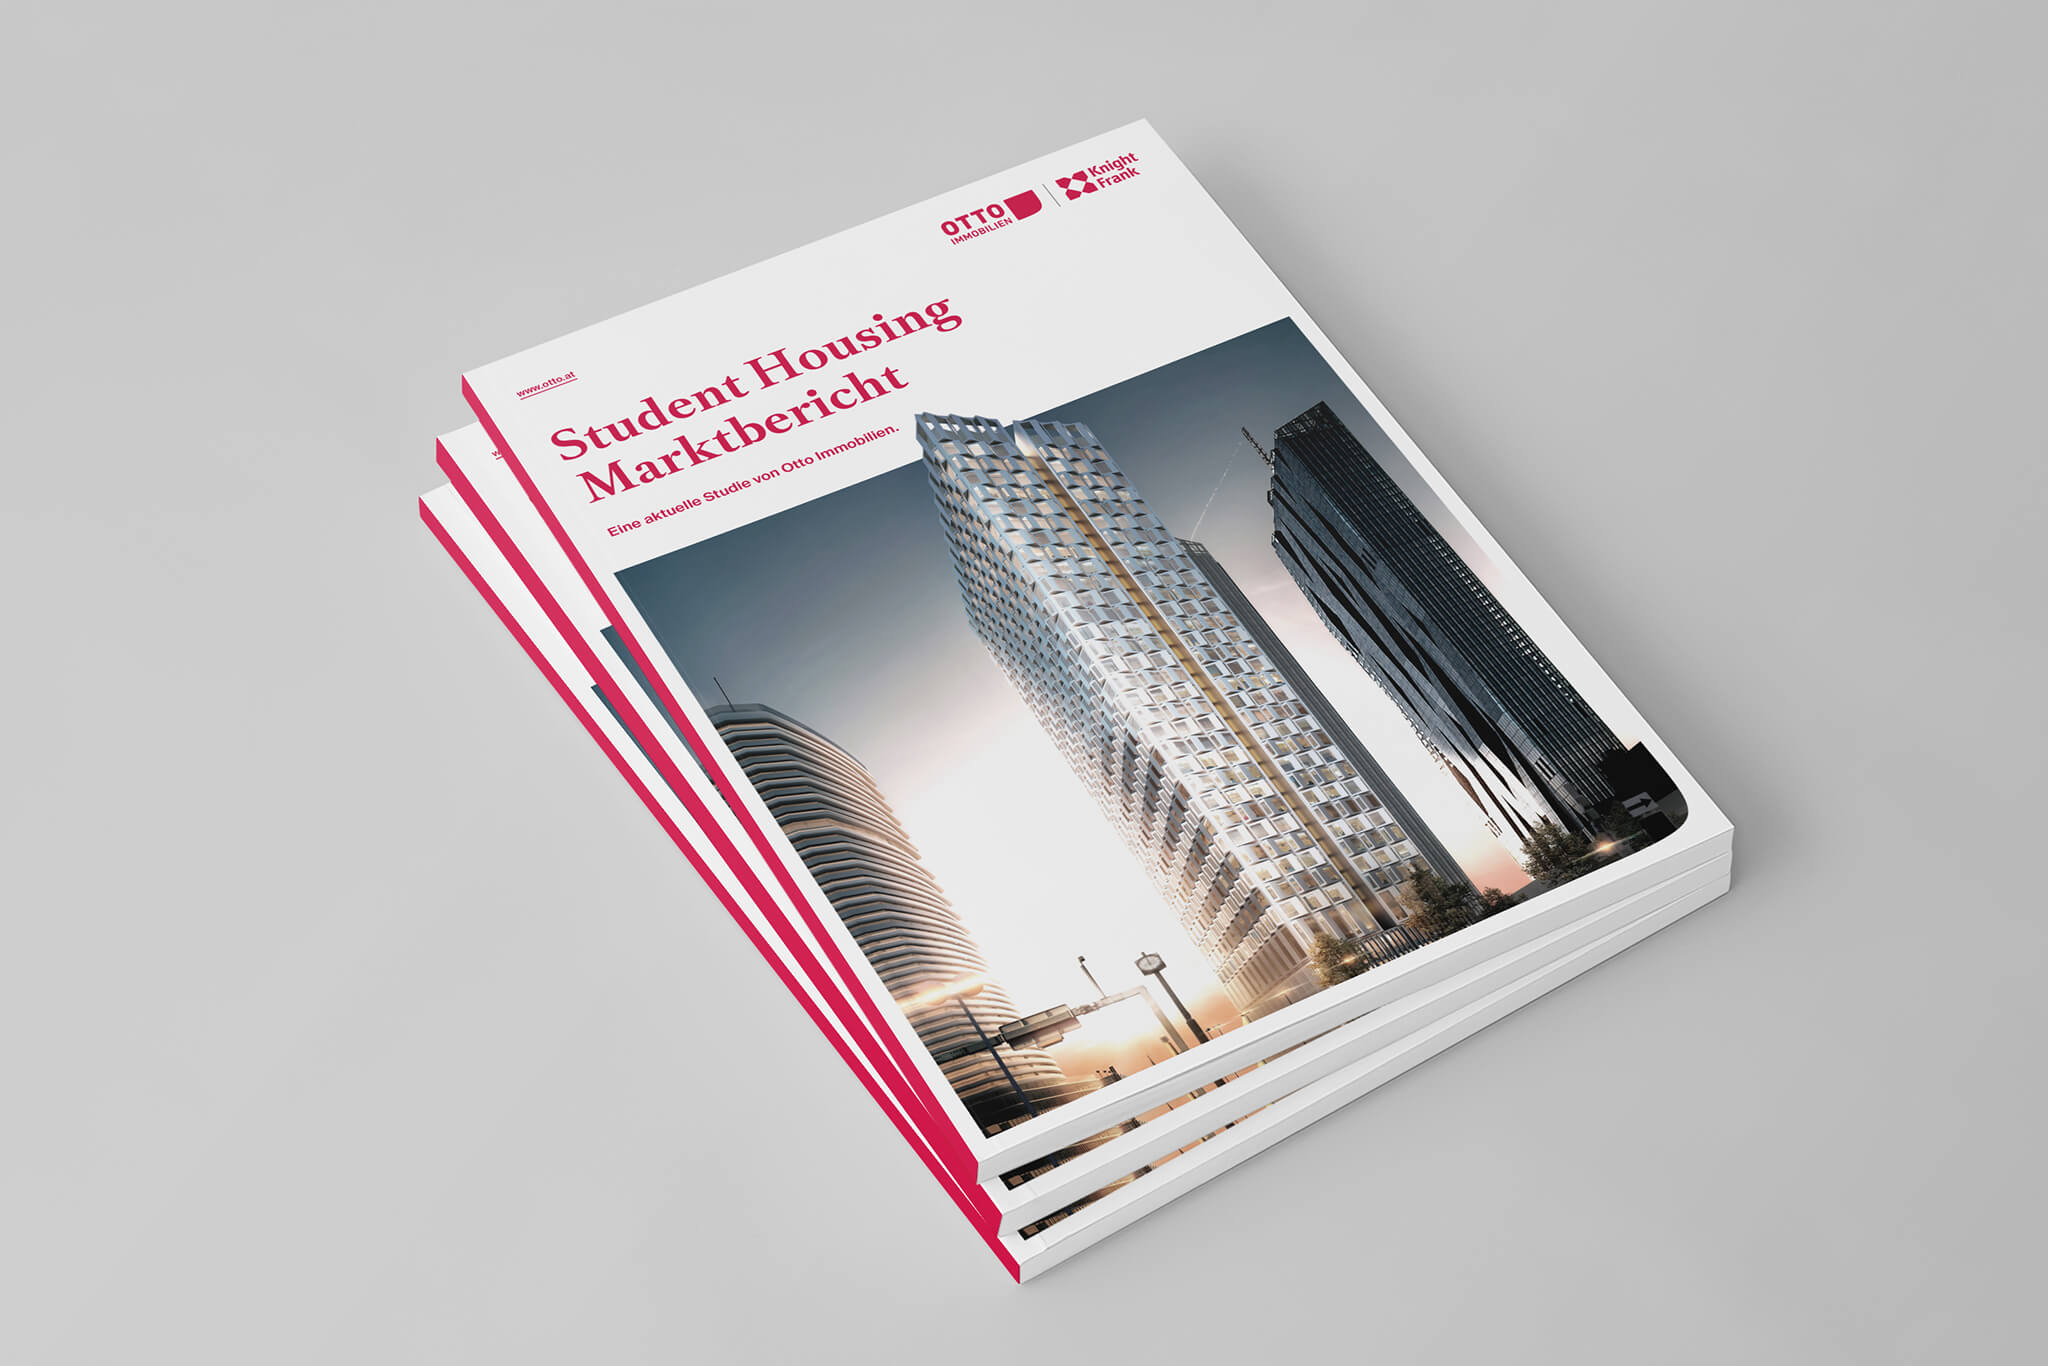 Otto Immobilien Marktbericht Cover